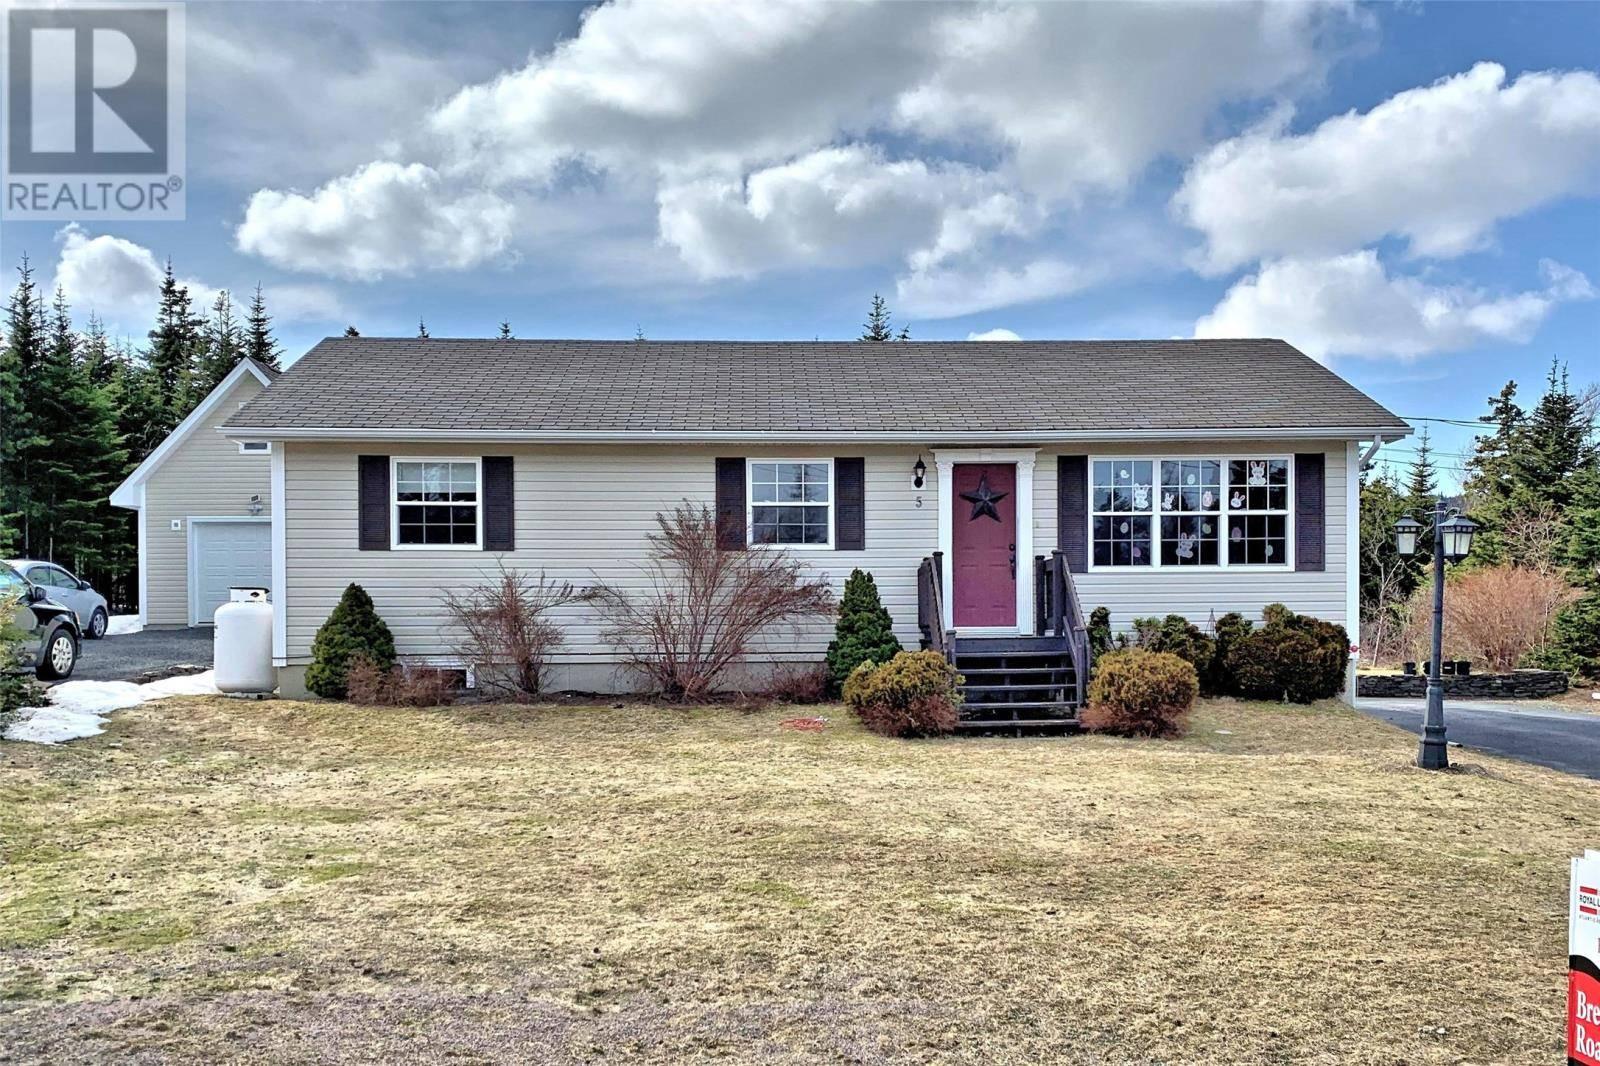 House for sale at 5 Mount Royal Estates Carbonear Newfoundland - MLS: 1208882